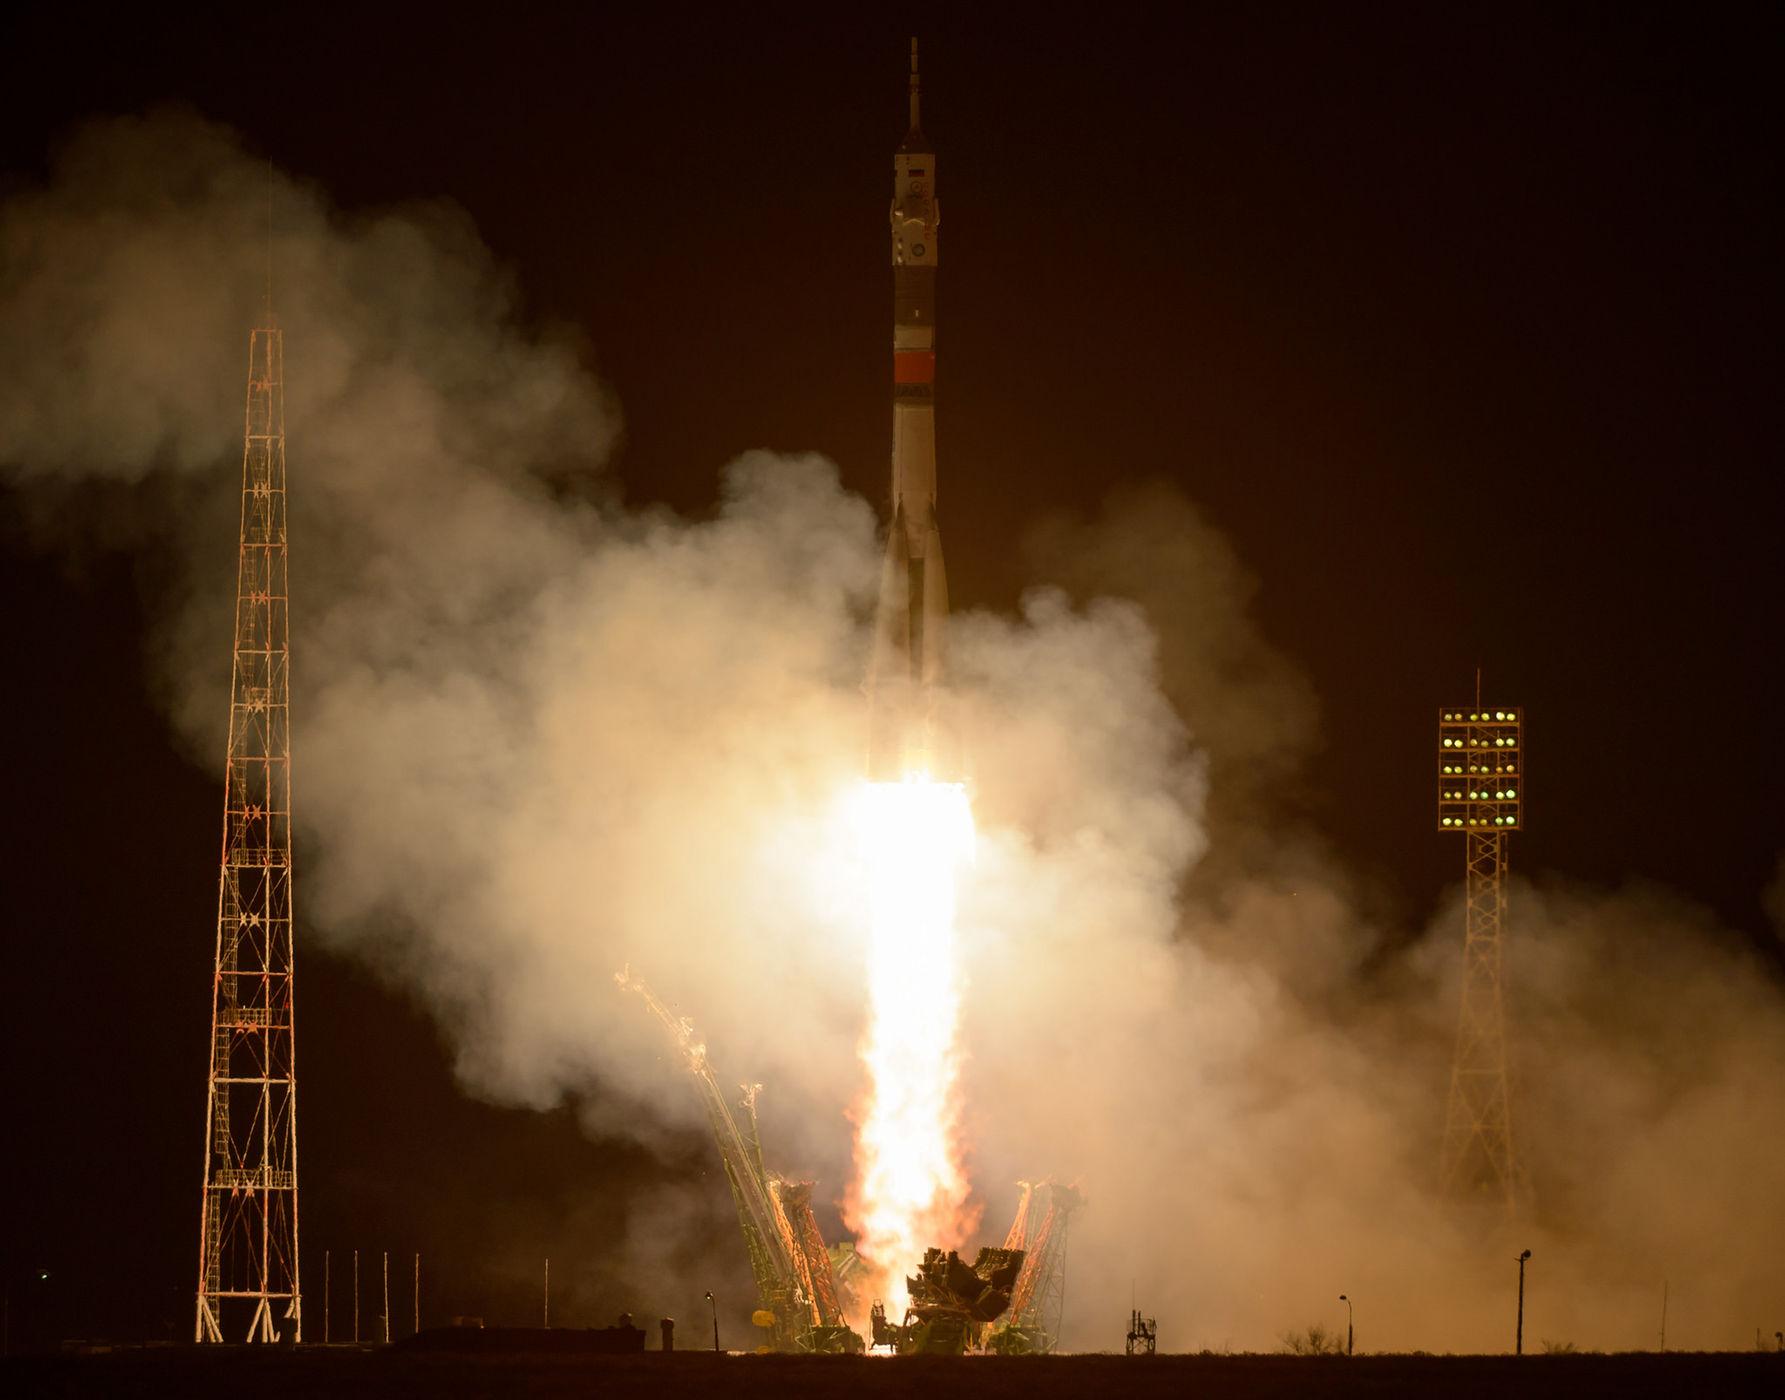 Lansiranje rakete Soyuz u okviru misije 50/51 - foto NASA